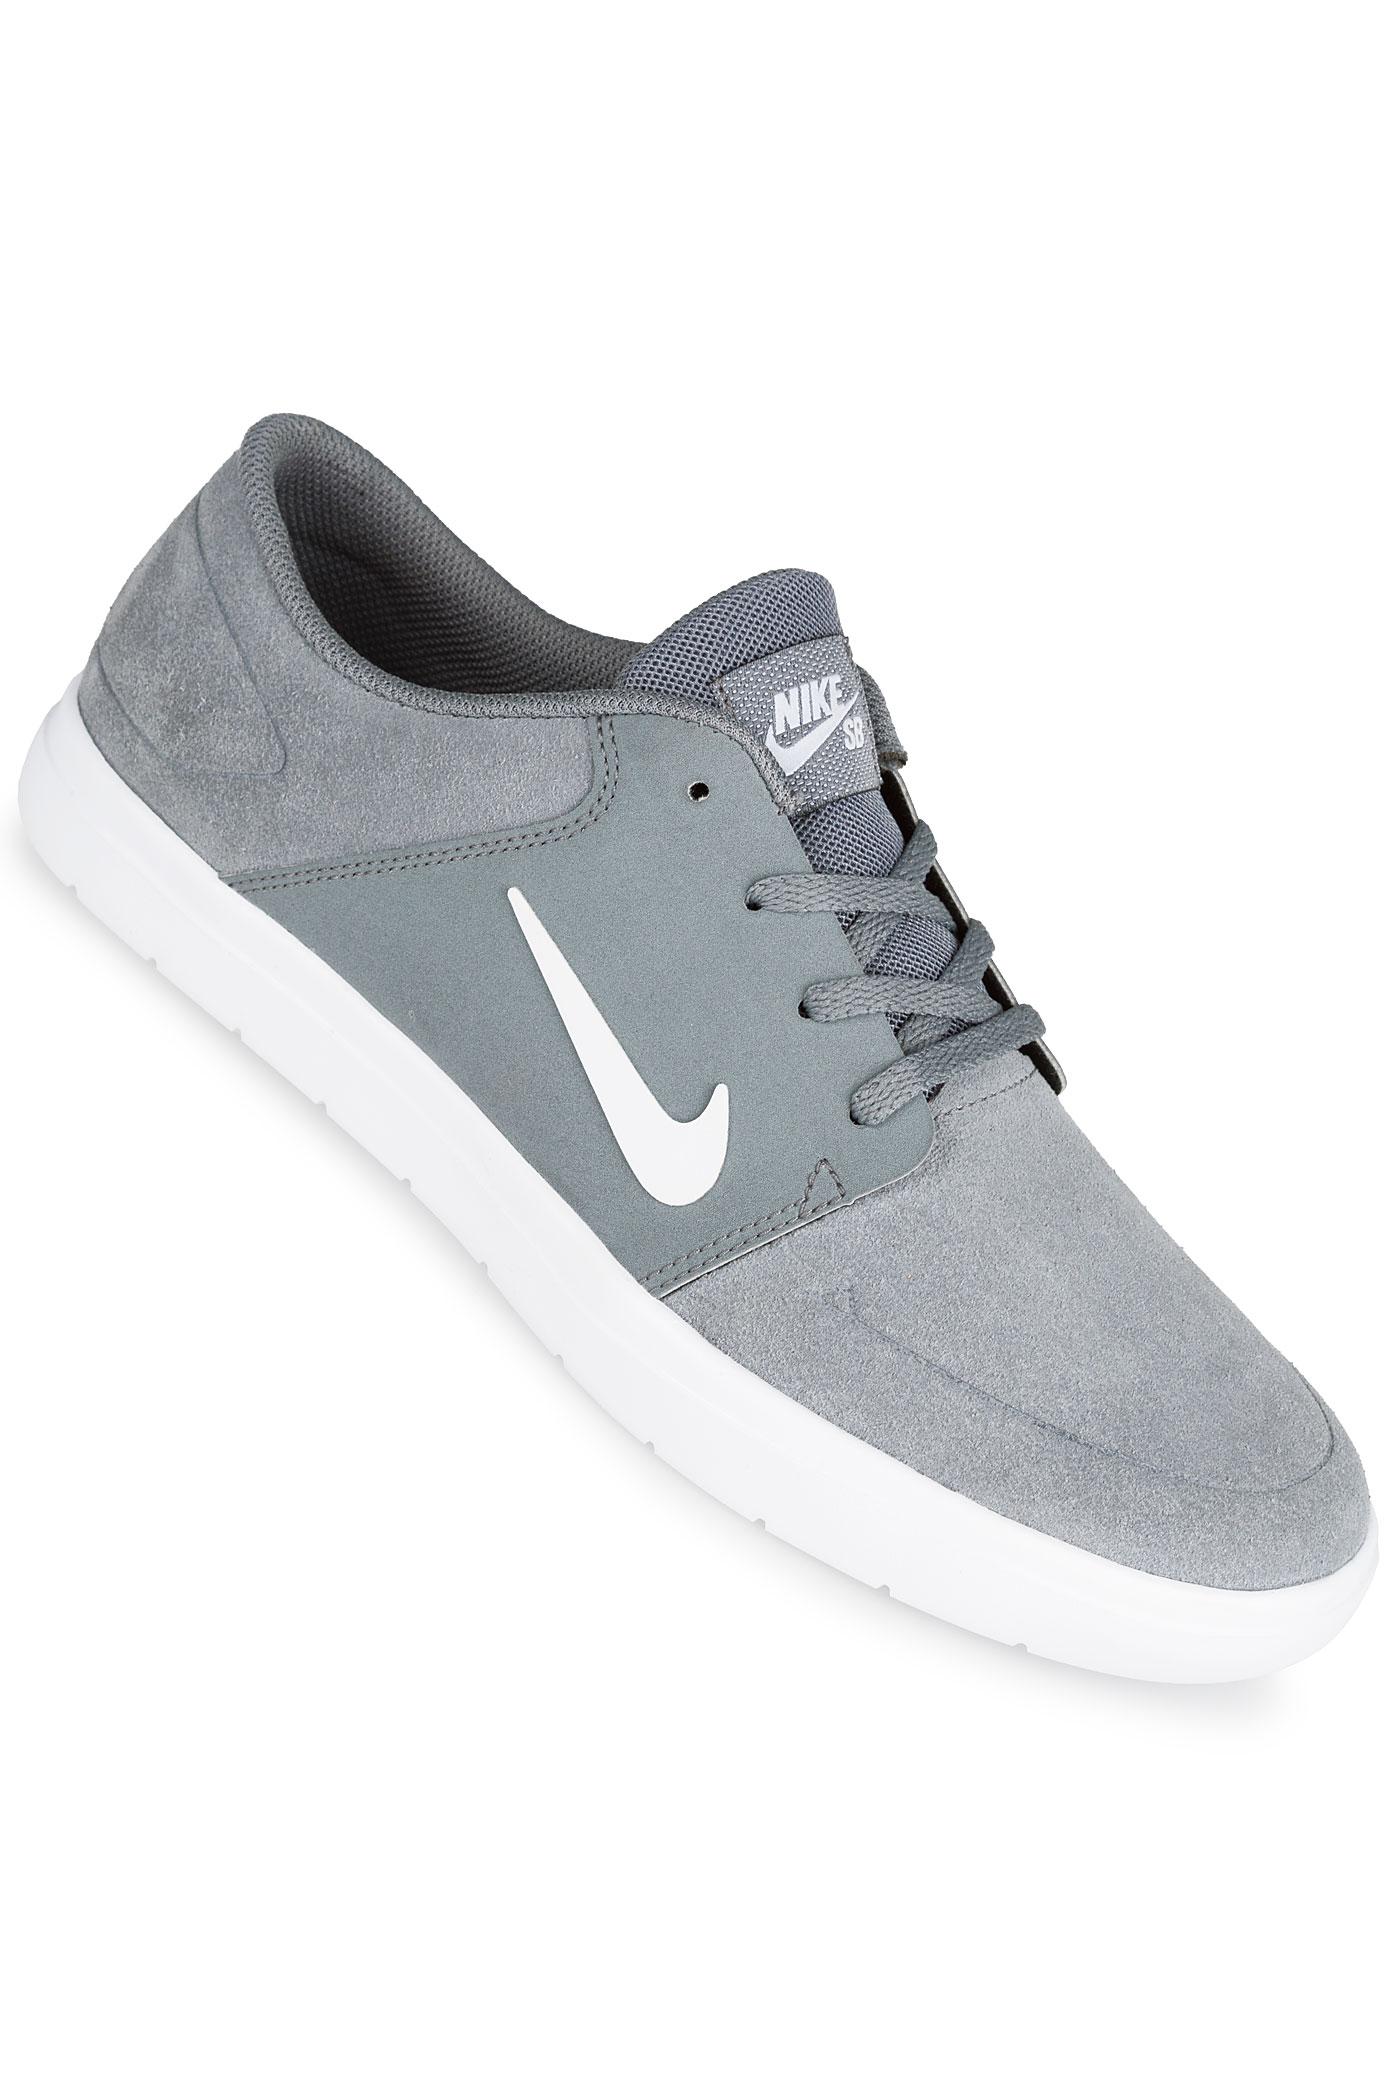 cool nike sb shoes